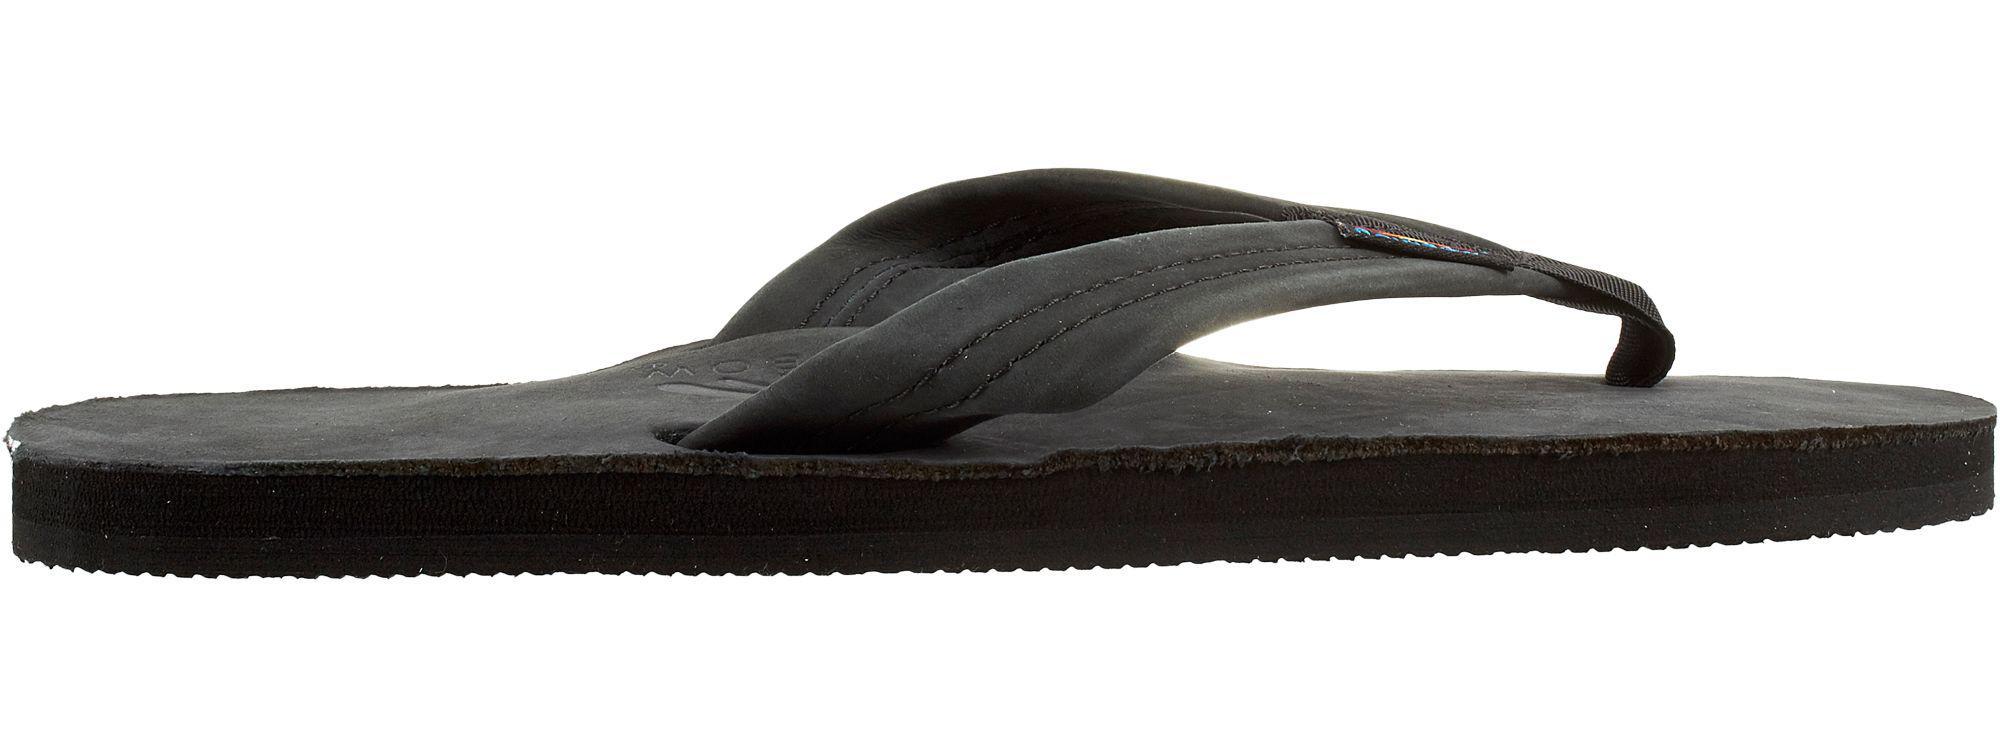 e3cba10eb49c Lyst - Rainbow Sandals Leather 301 Flip Flops in Black for Men